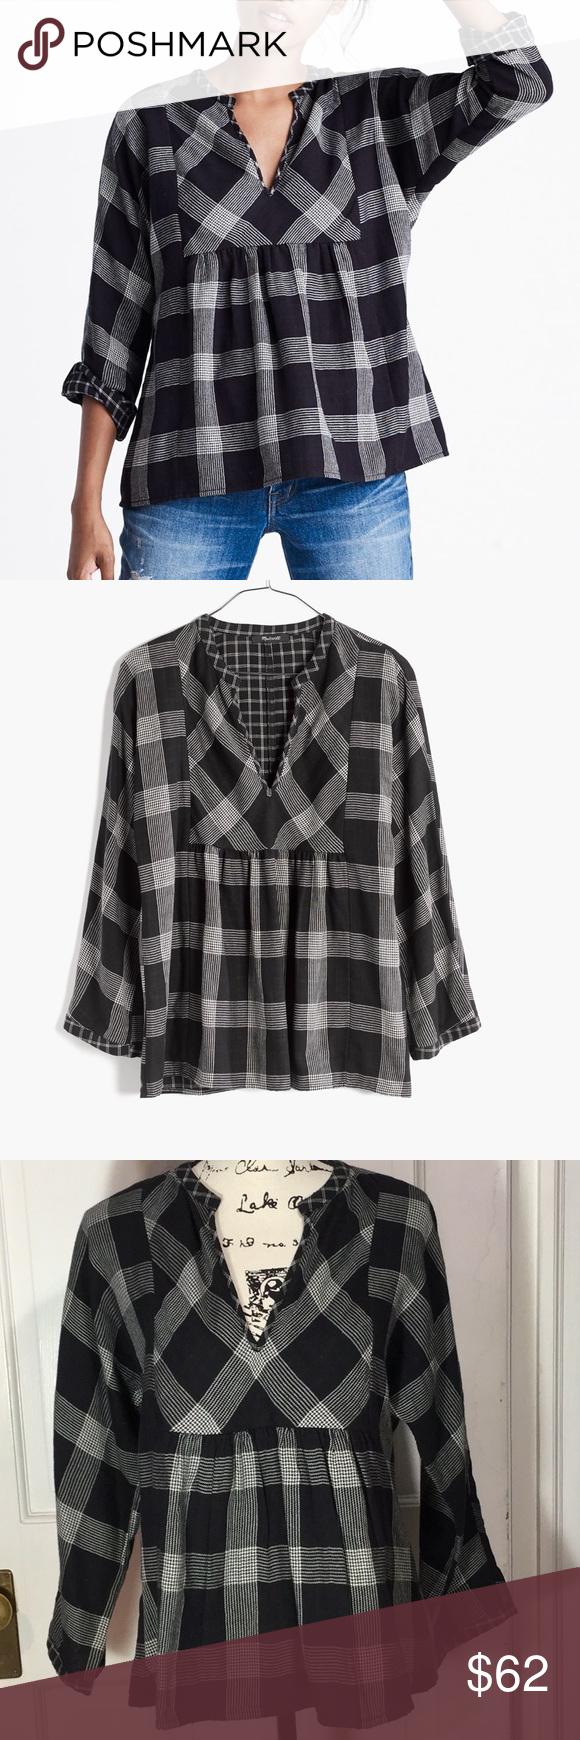 Mandarin collar flannel  Madewell M Boheme Popover black plaid flannel  My Posh Picks